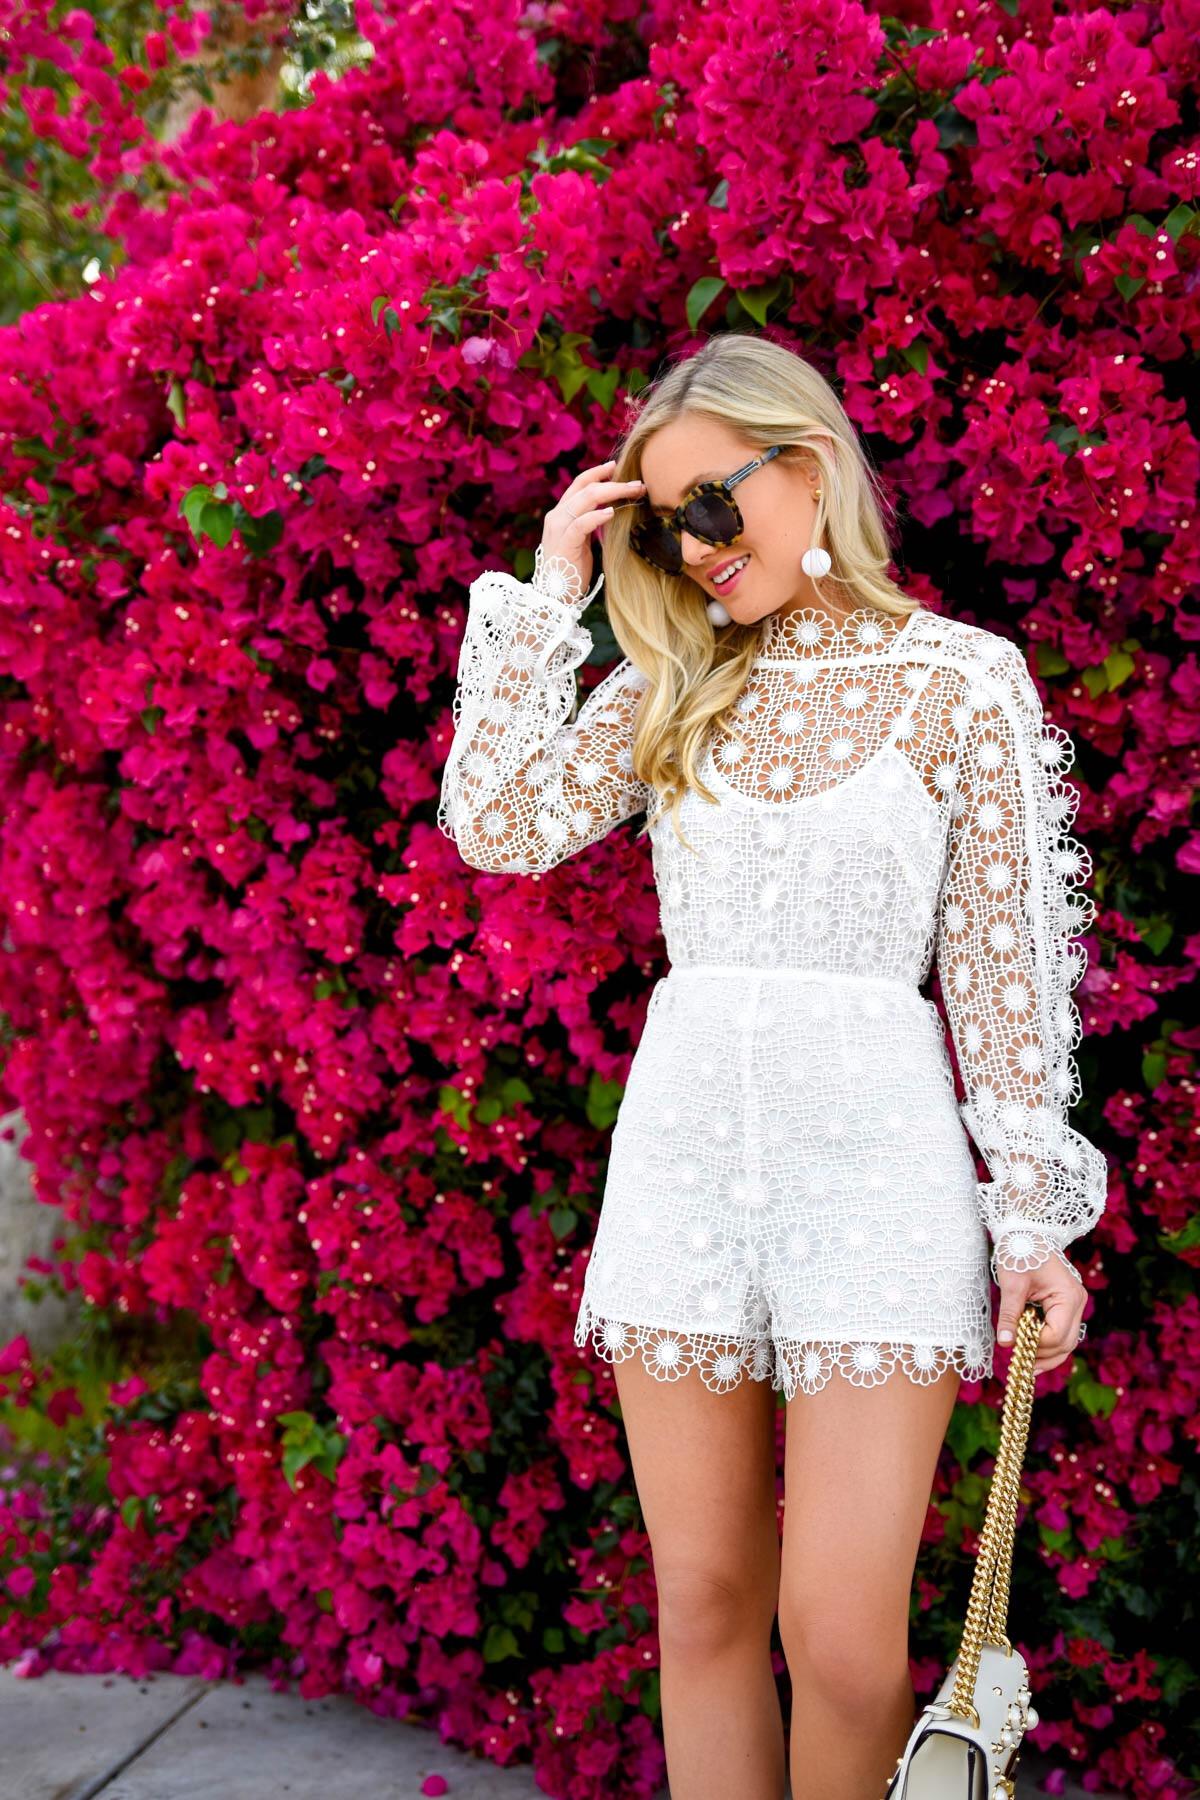 Alice-McCall-Romper, White-Lace-Romper, Gucci-Handbag, Stuart-Weitzman-Heels, Kenneth-Jay-Lane-Earrings, Palm-Springs, Travel-Blogger, Lo-Murphy